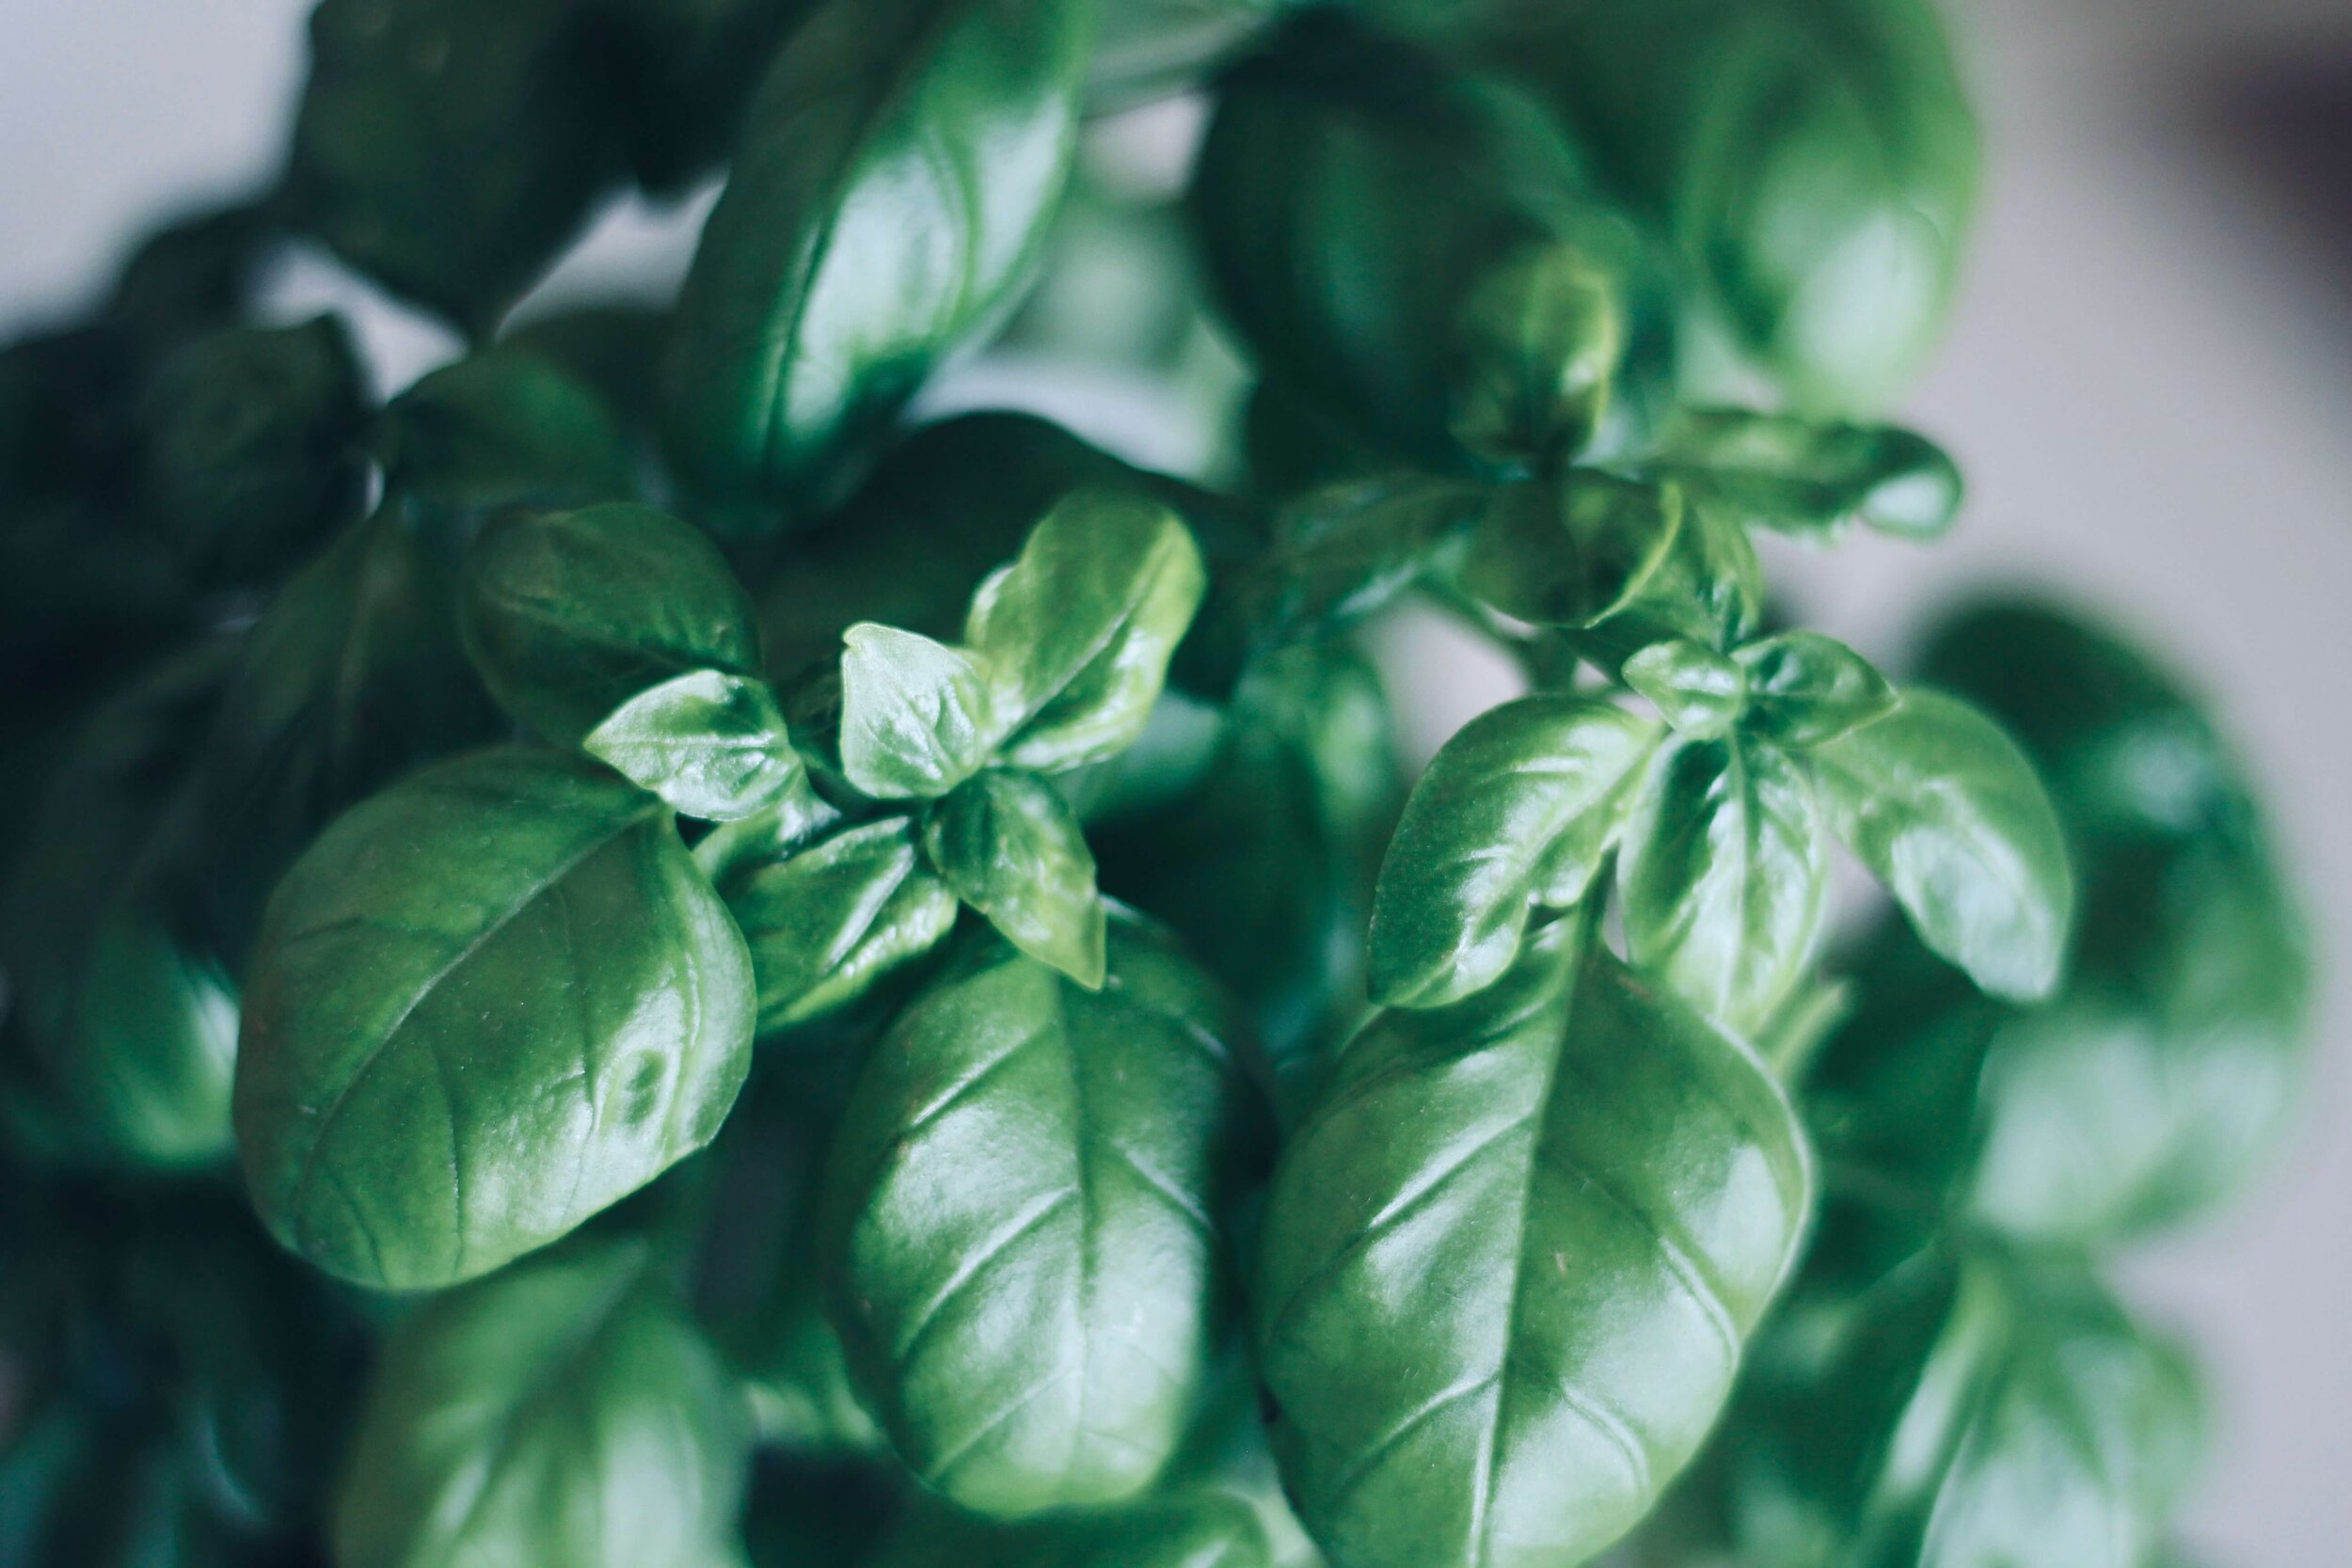 calcium rich basil and herbs